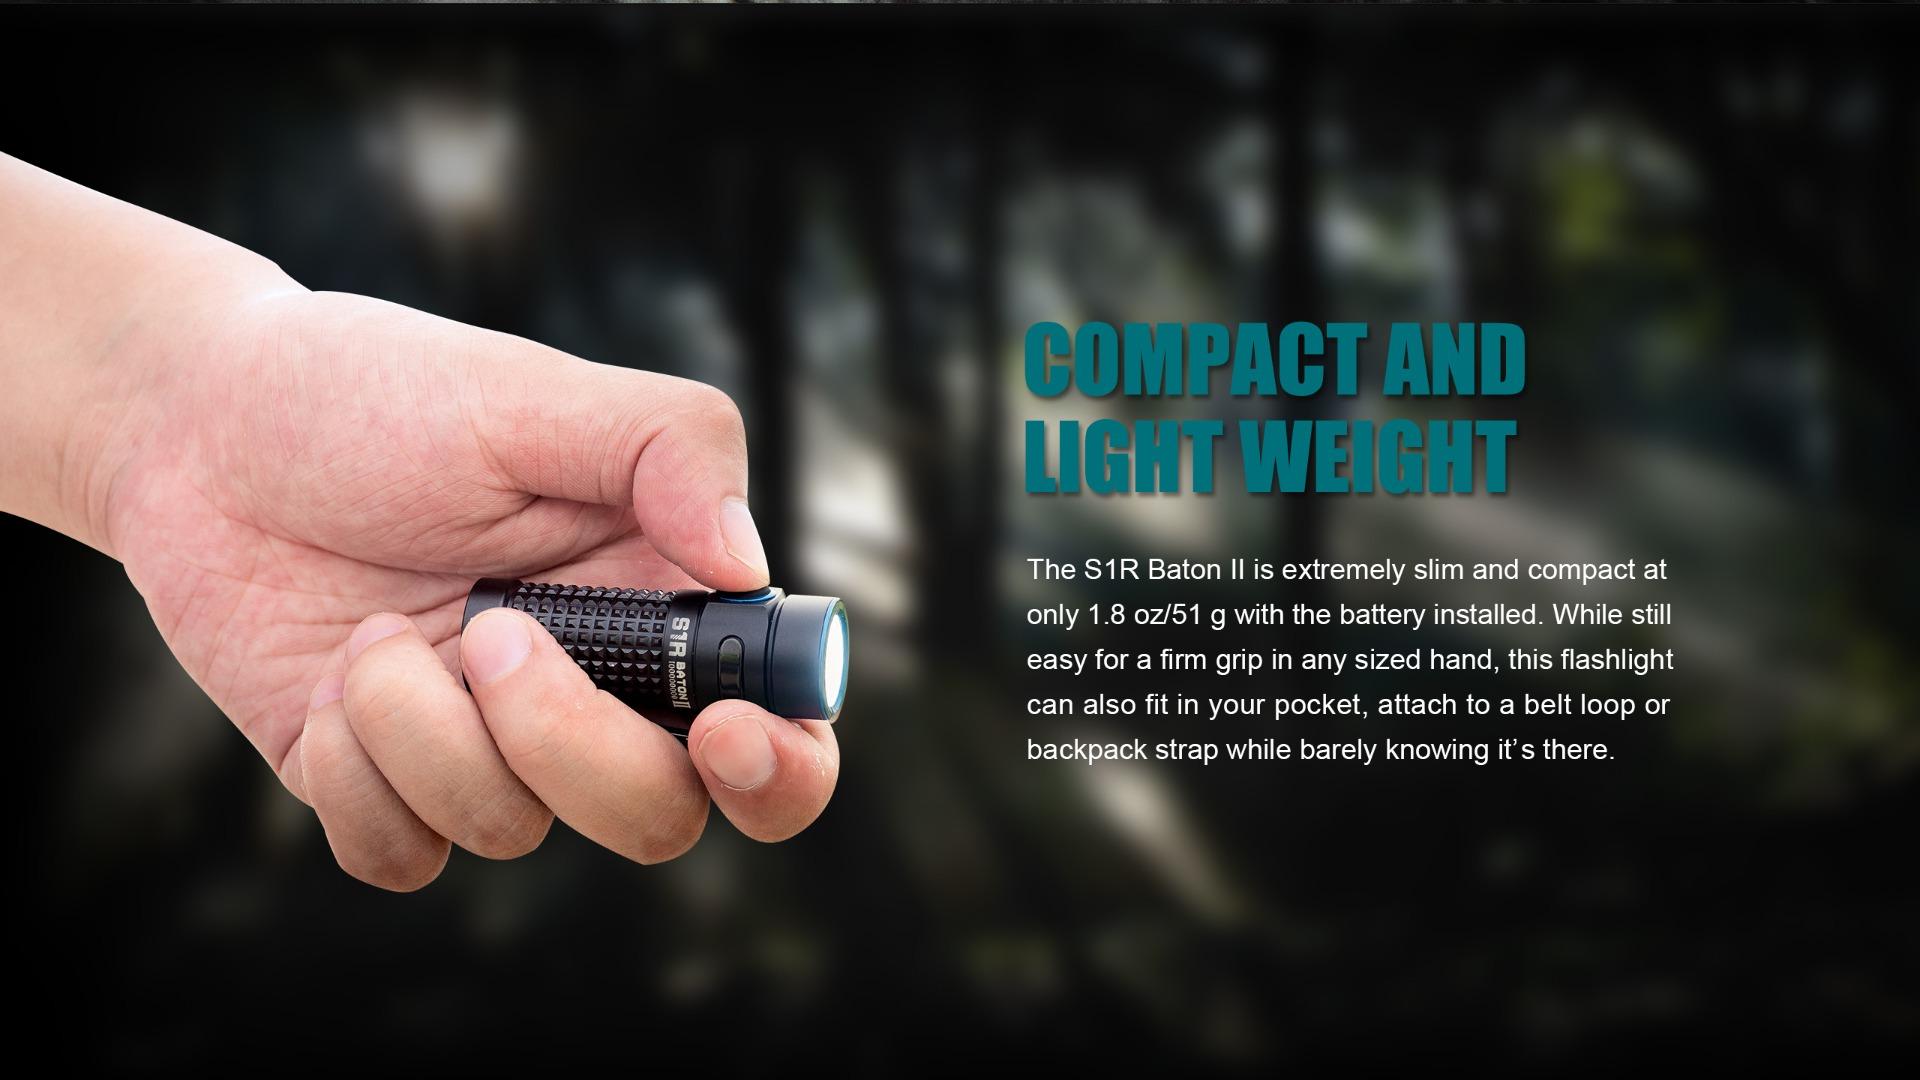 S1R Baton II  EDC Flashlight Compact